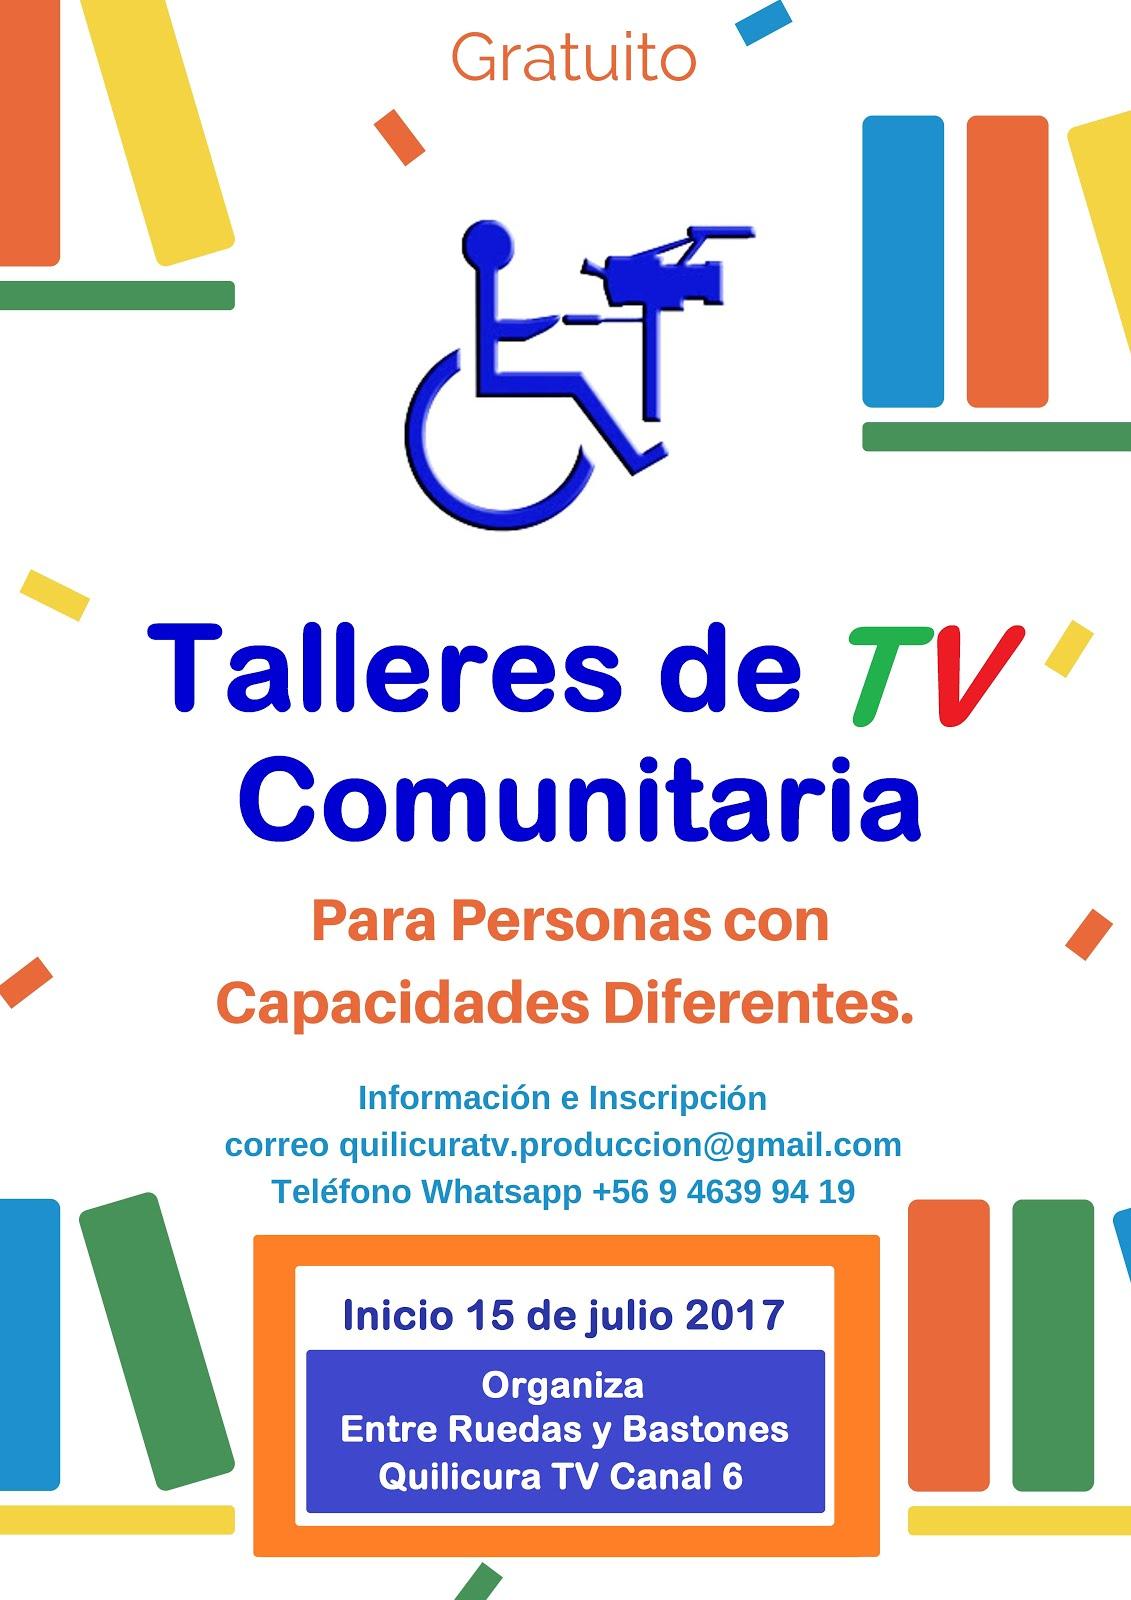 TALLERES DE TV PARA PERSONAS CON CAPACIDADES DIFERENTES Quilicura TV 2017